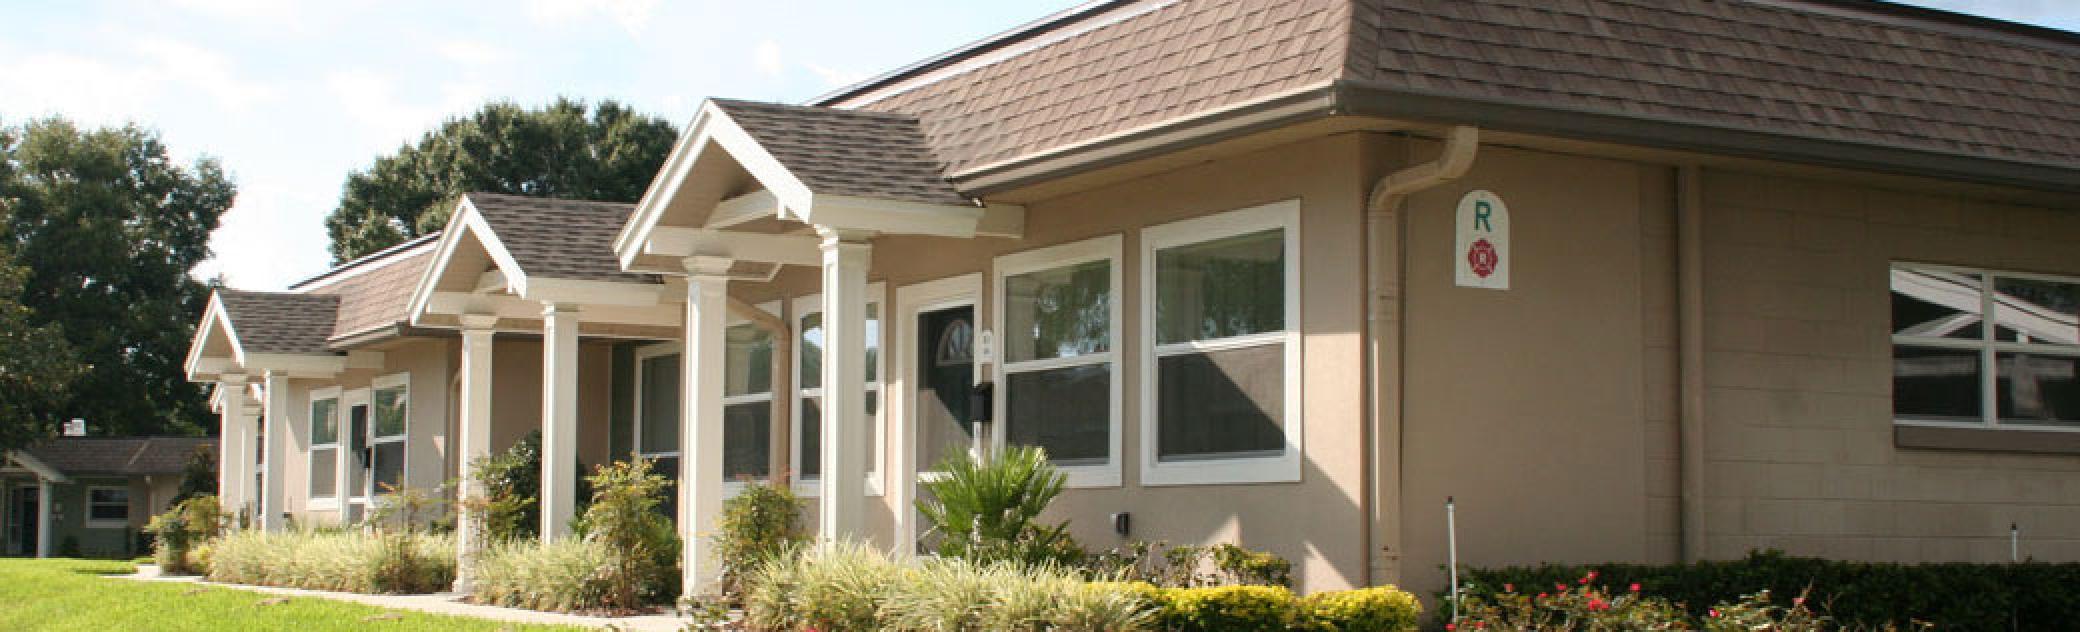 Garden Home Exterior Slider Image